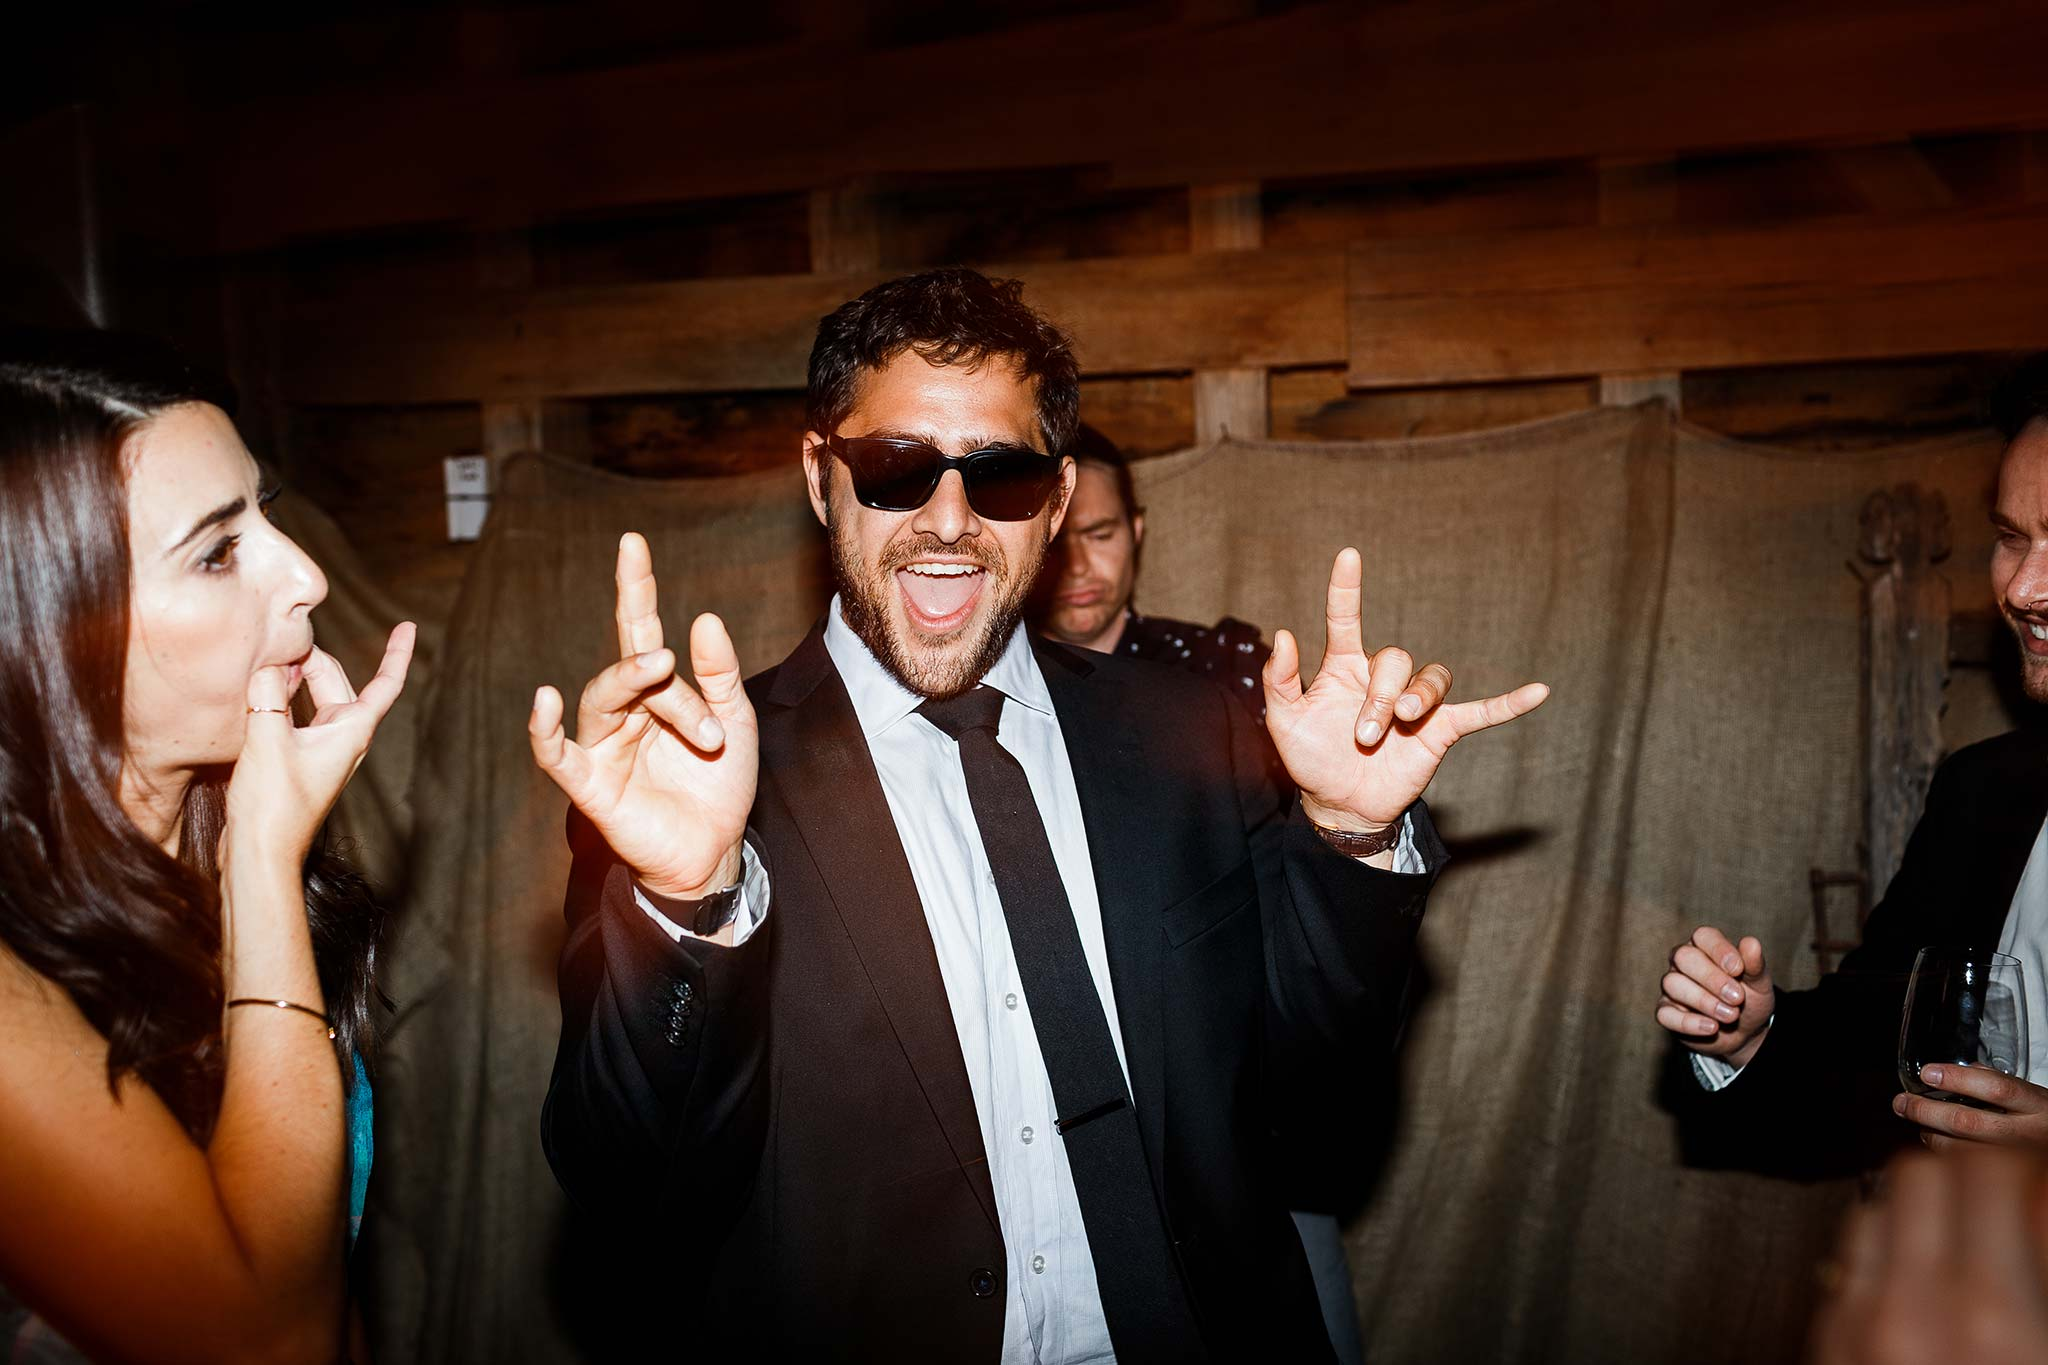 Launceston-Brickendon-barn-Wedding-Photographer-reception-dance-floor